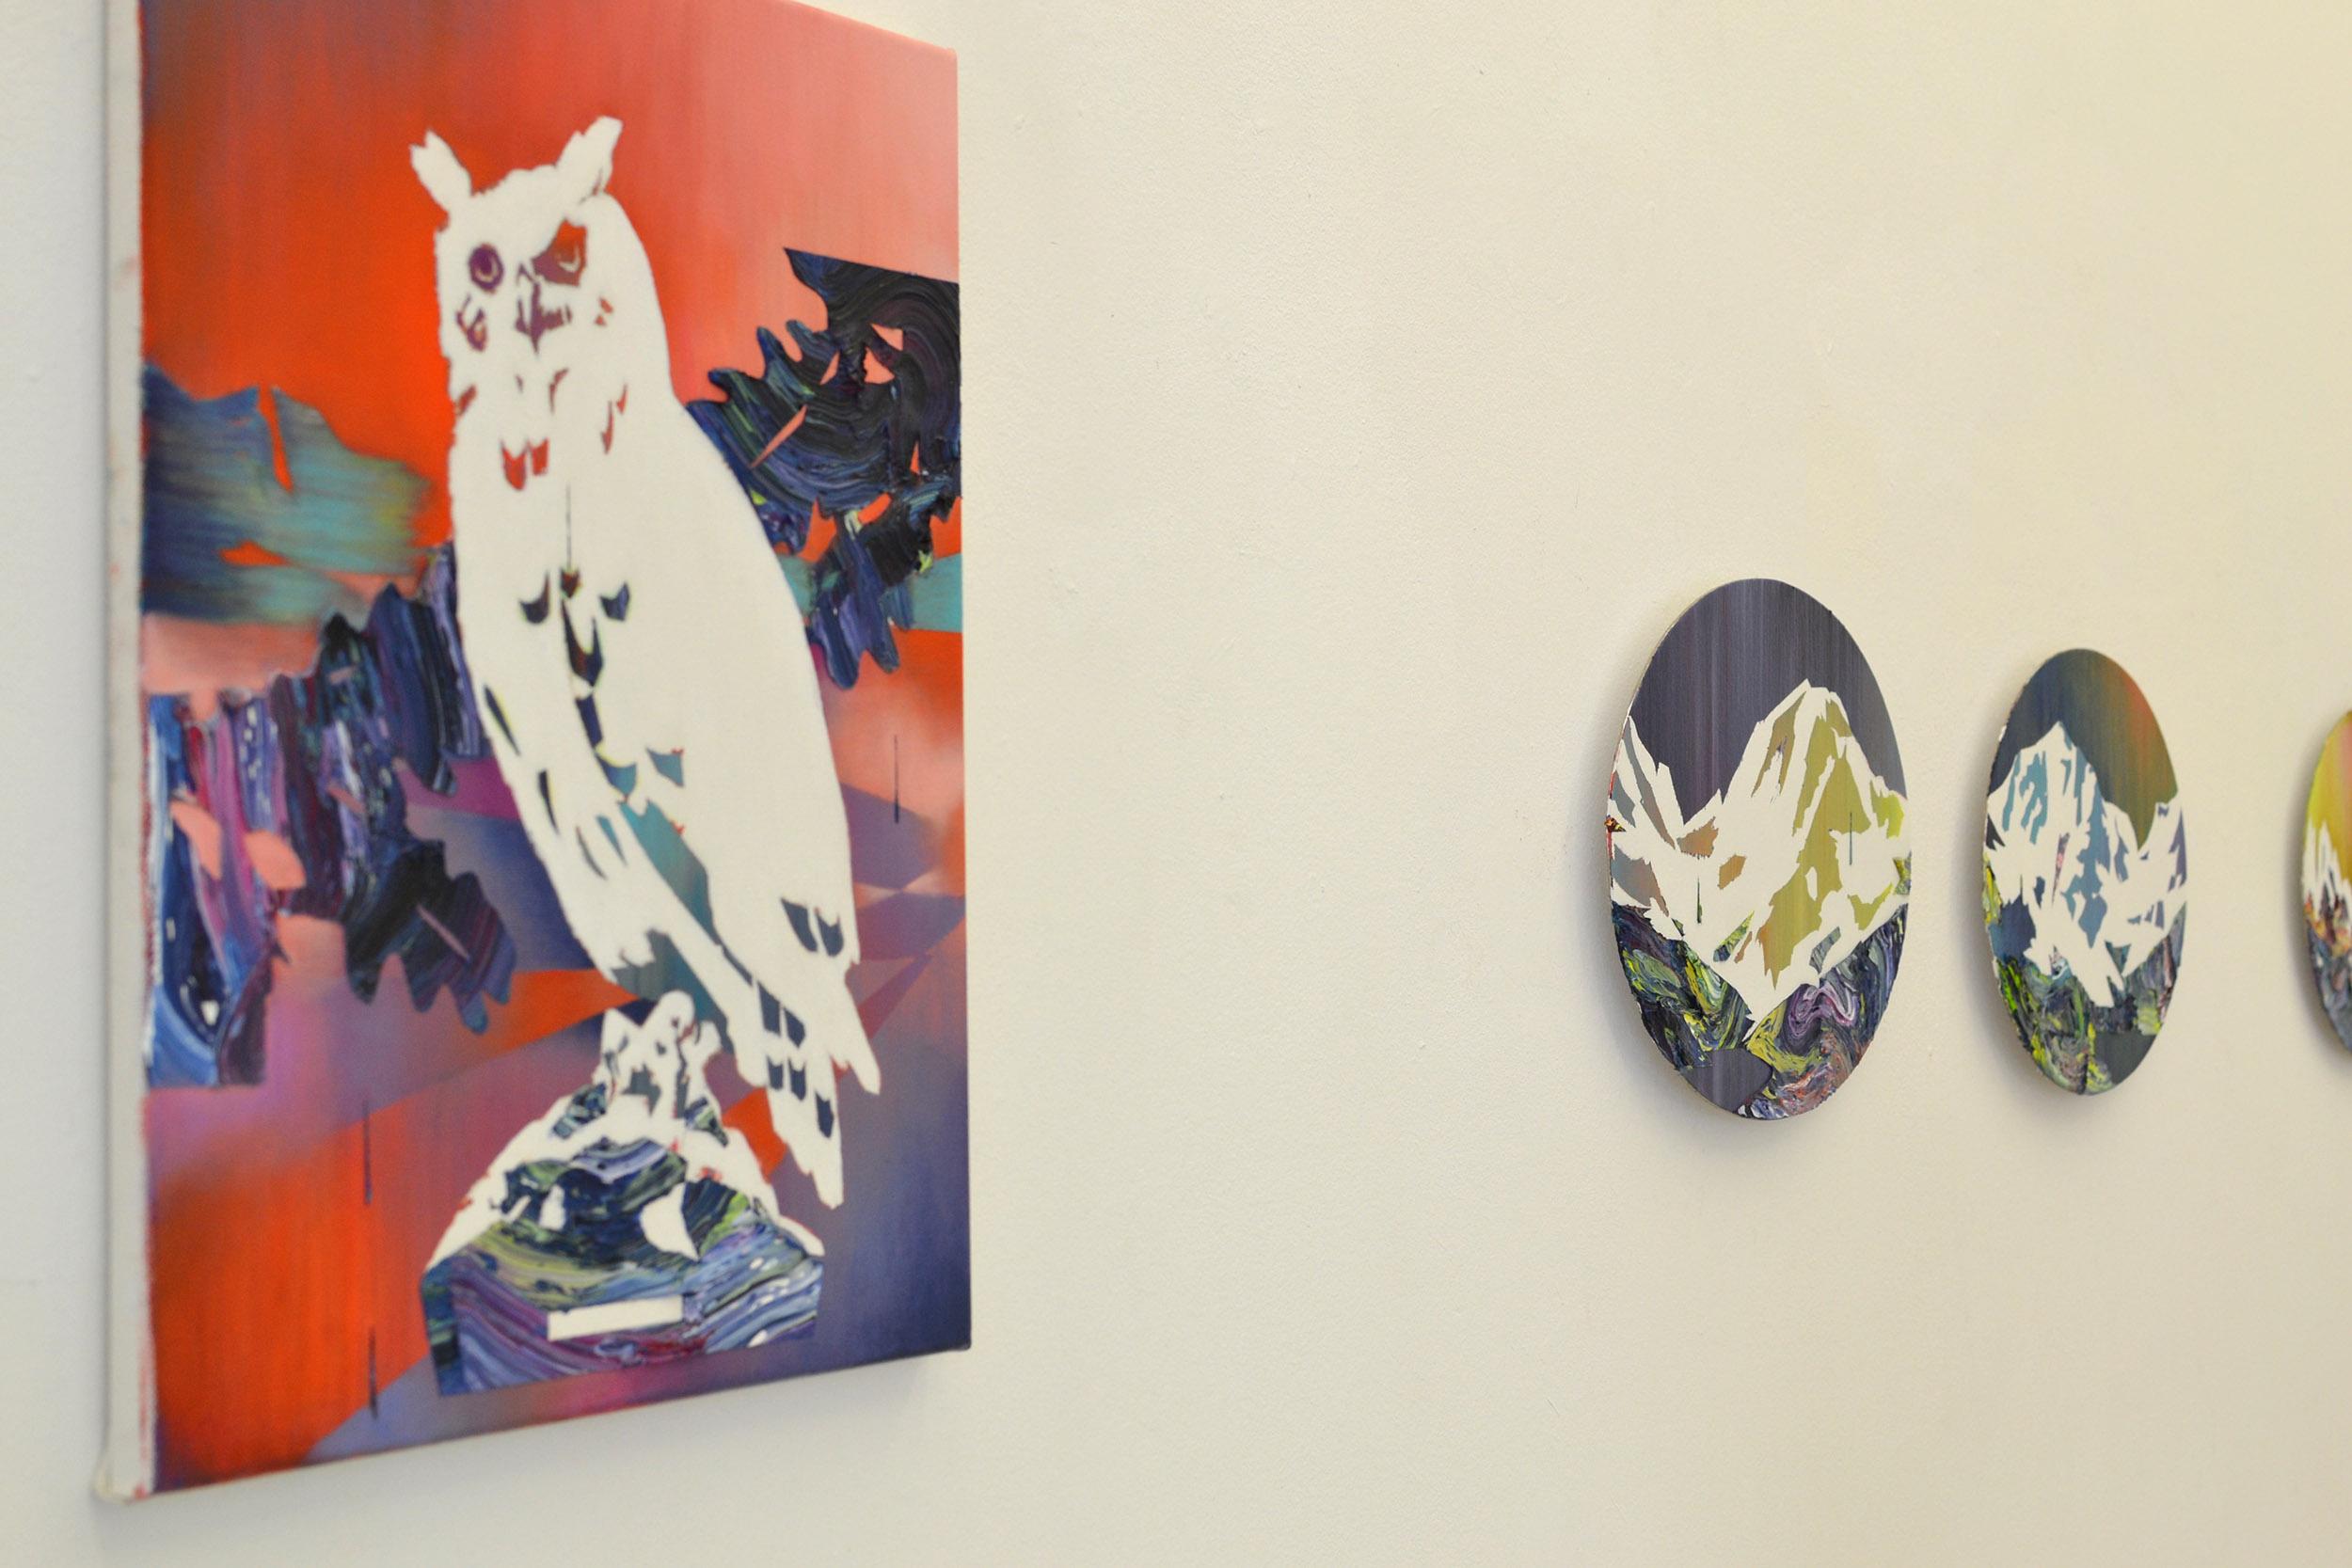 Matthias Moravek, %22Gran Paradiso%22, exhibition view9, 2011.jpg